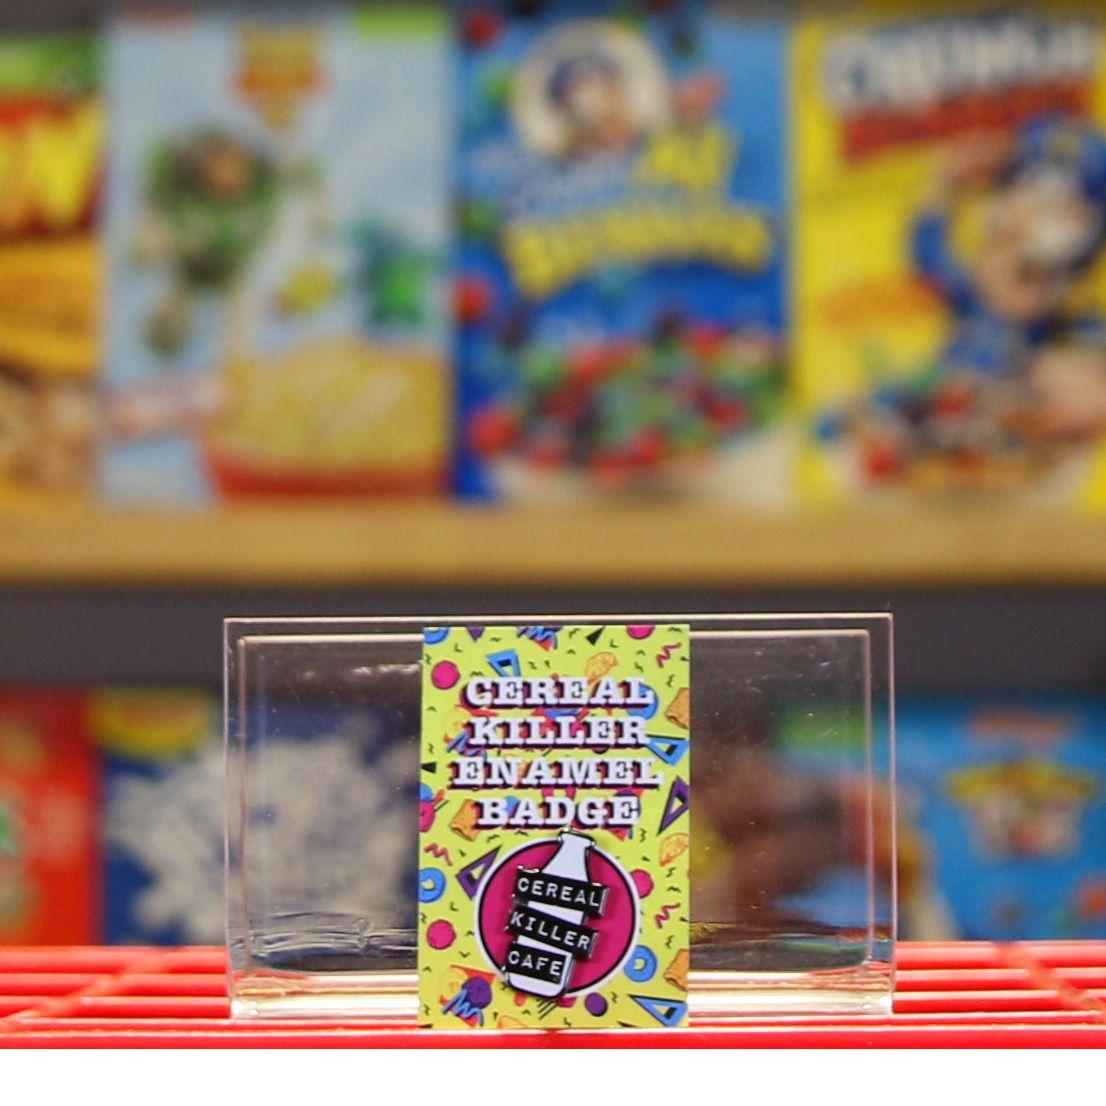 Cereal Killer enamel badge merch